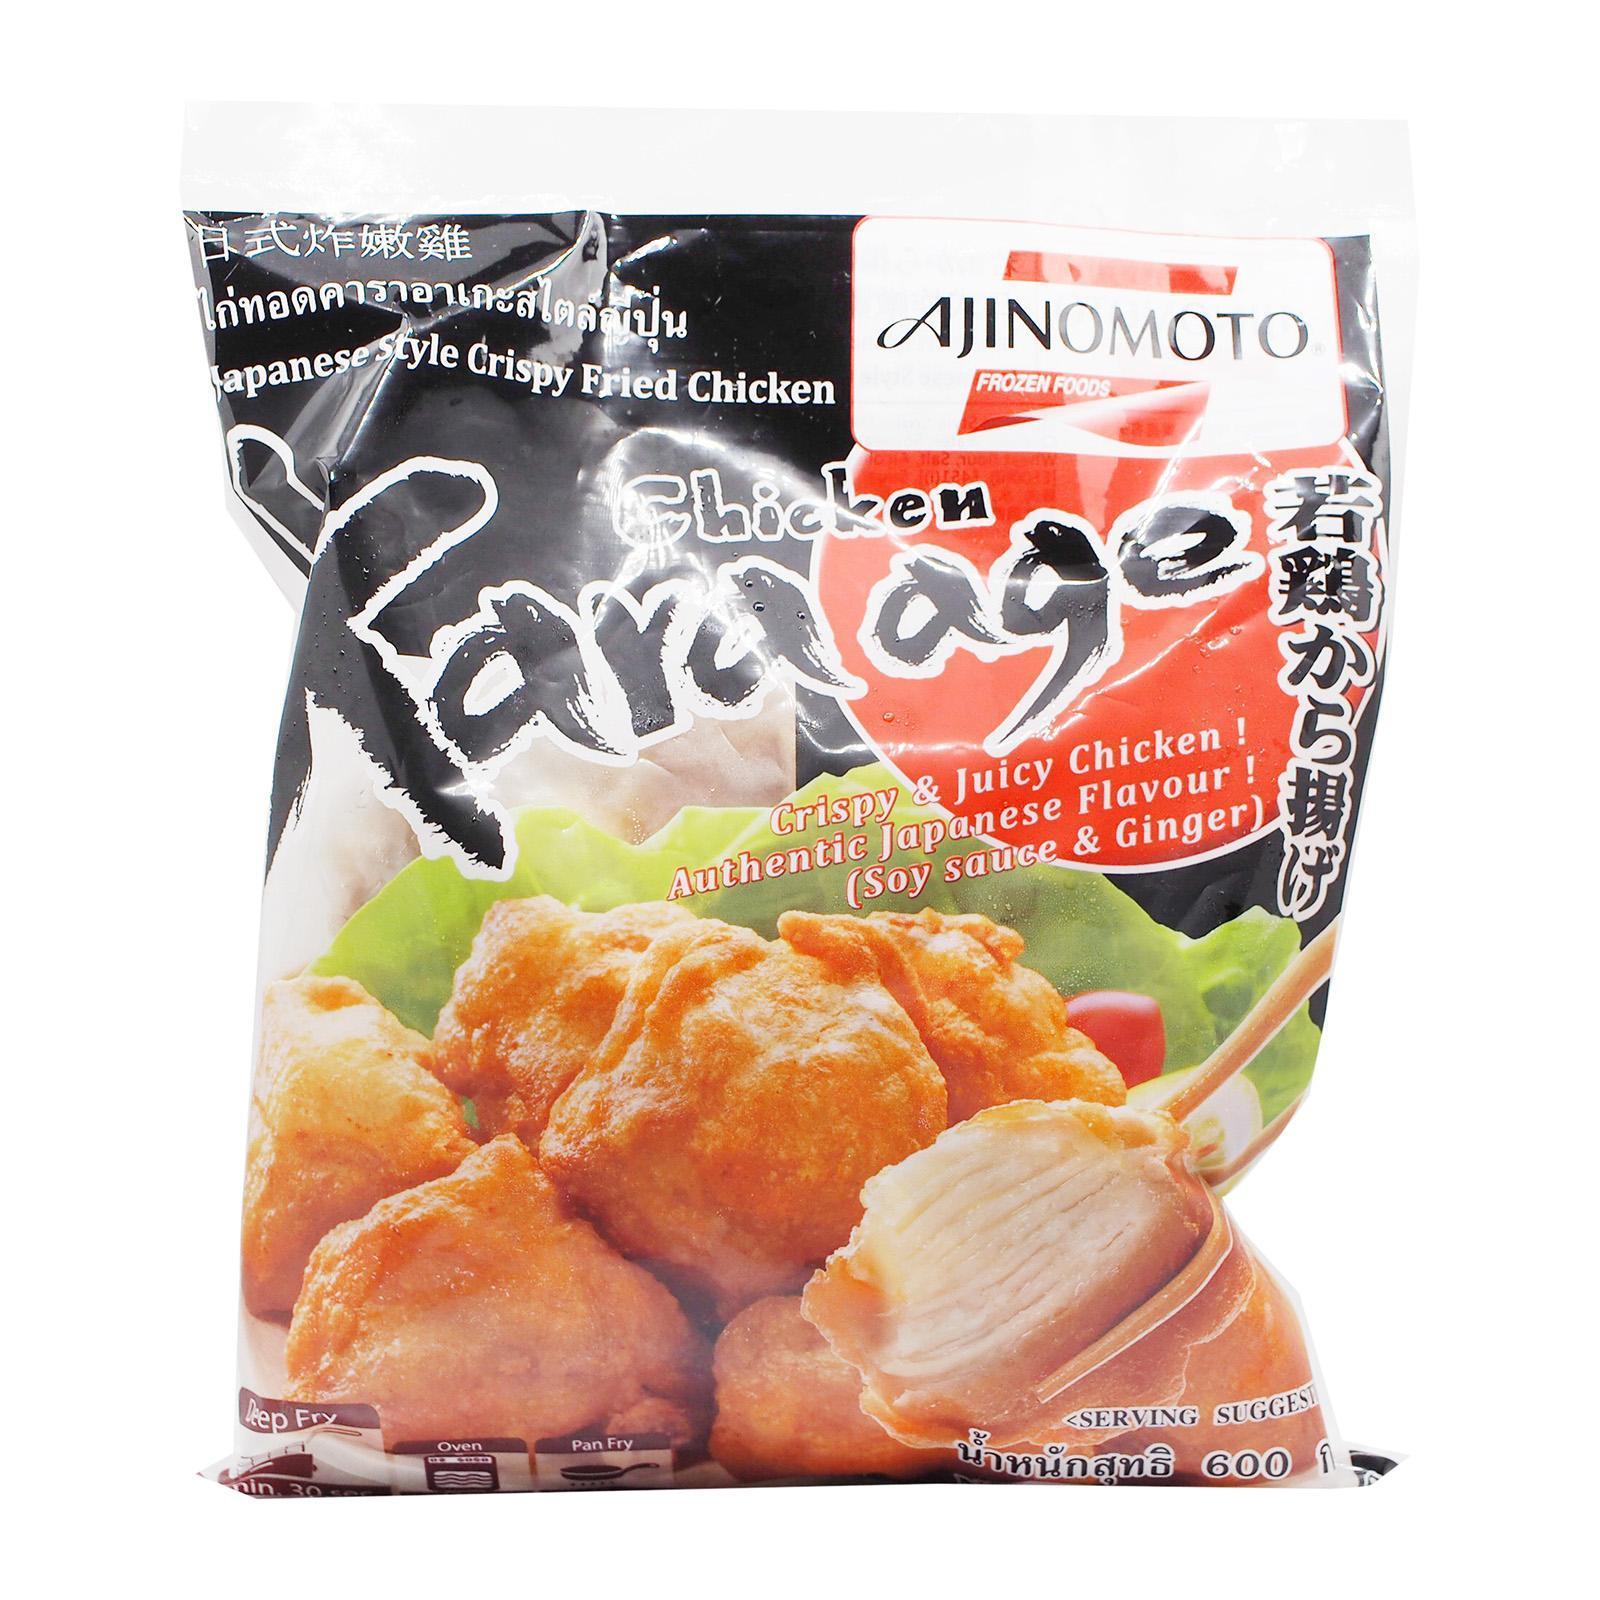 Ajinomoto Crispy Fried Chicken Karaage - Frozen